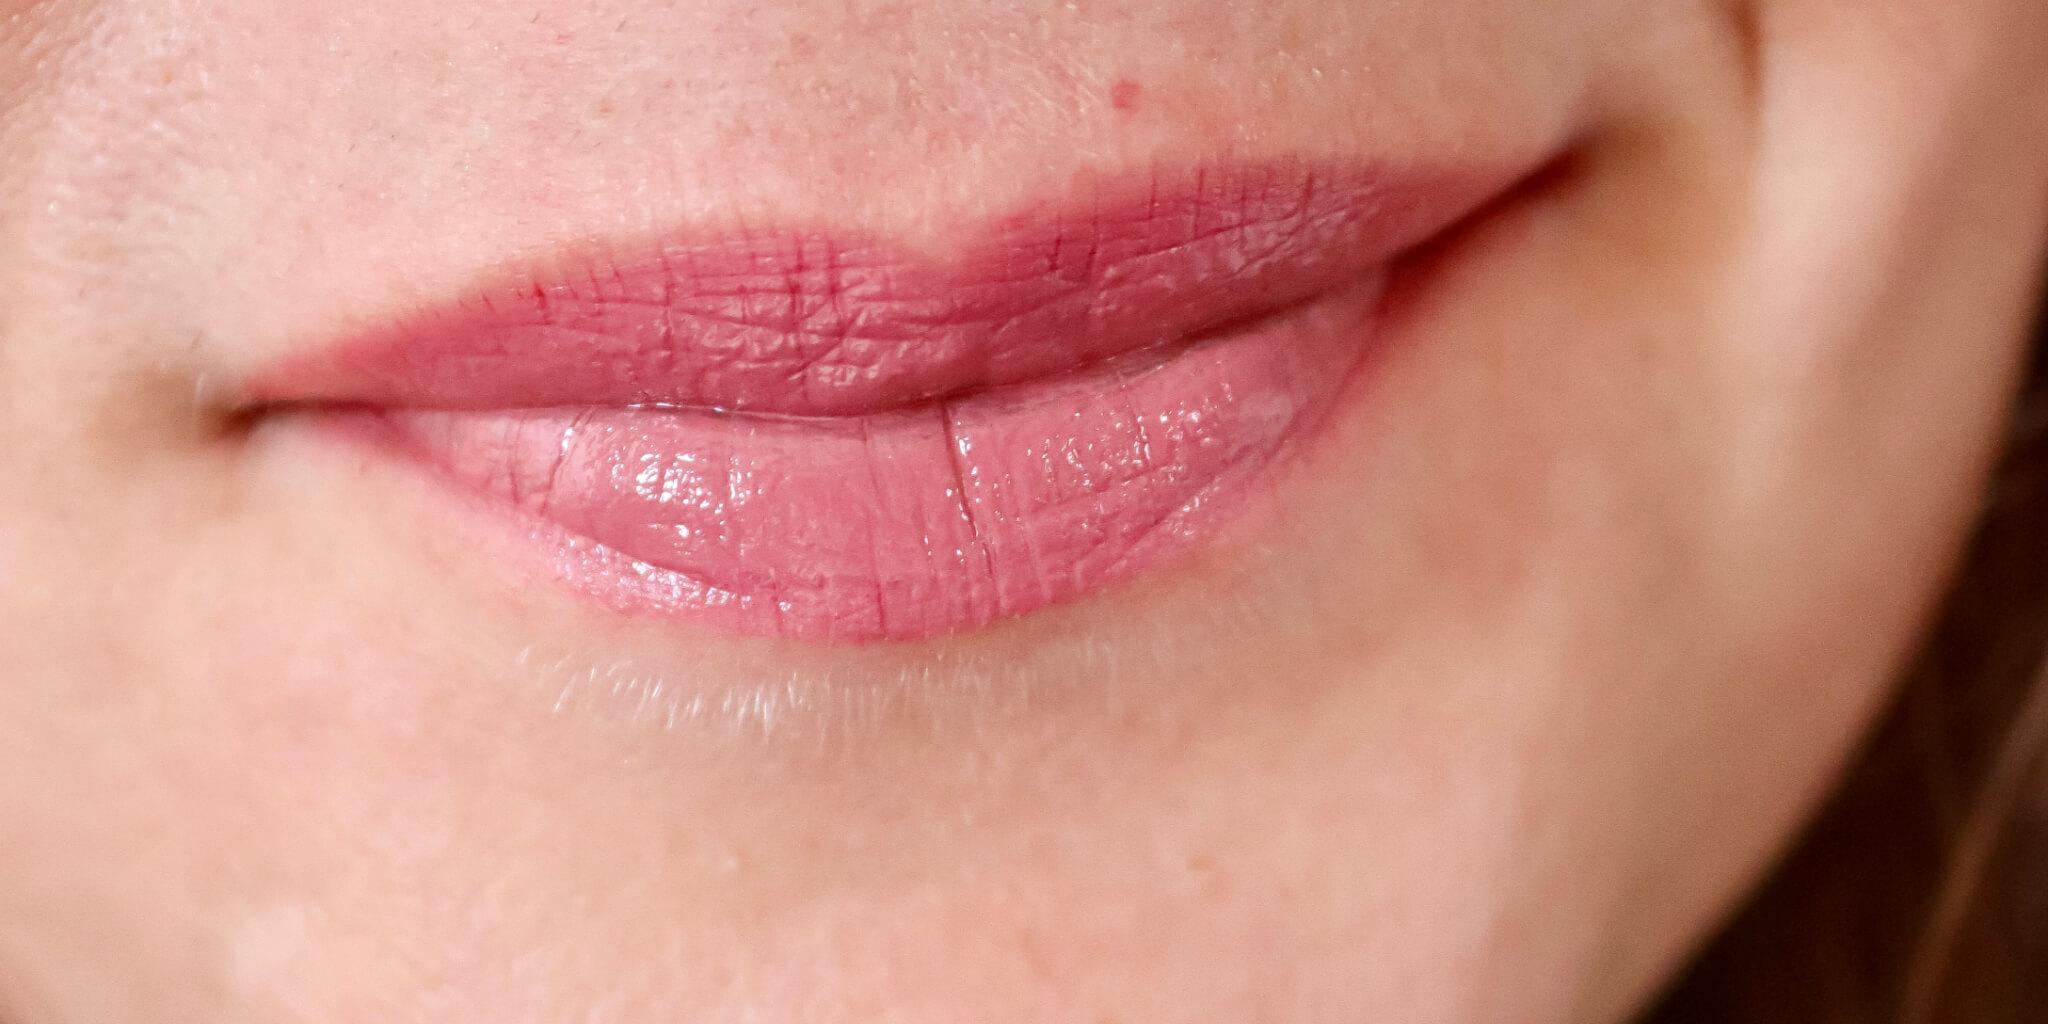 Lippen Lippenpflege schöne Lippen Dermalogica Clarins Beauty Pflege